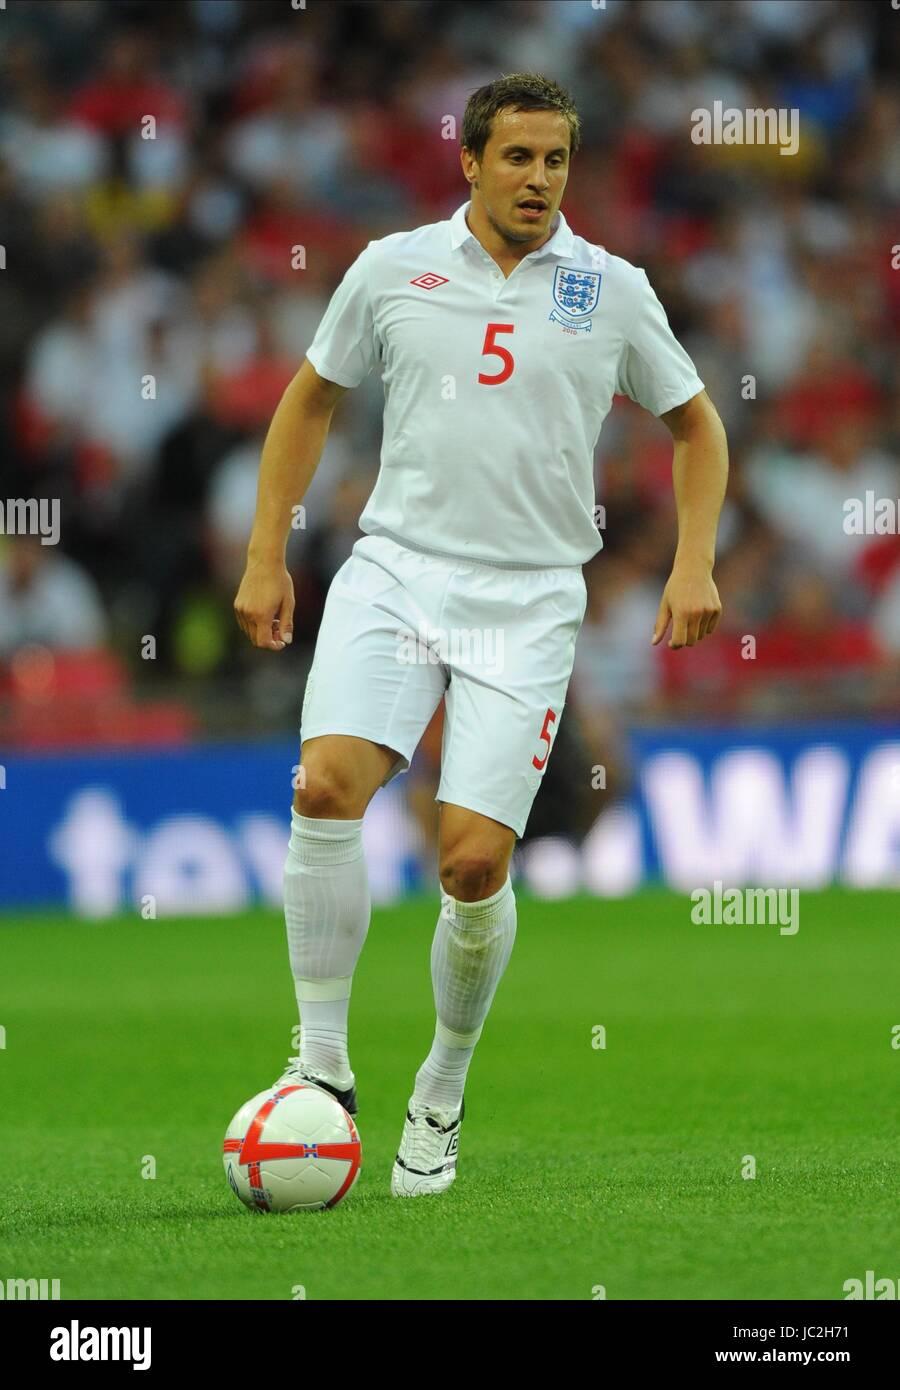 PHIL JAGIELKA ENGLAND WEMBLEY STADIUM LONDON ENGLAND 11 August 2010 - Stock Image